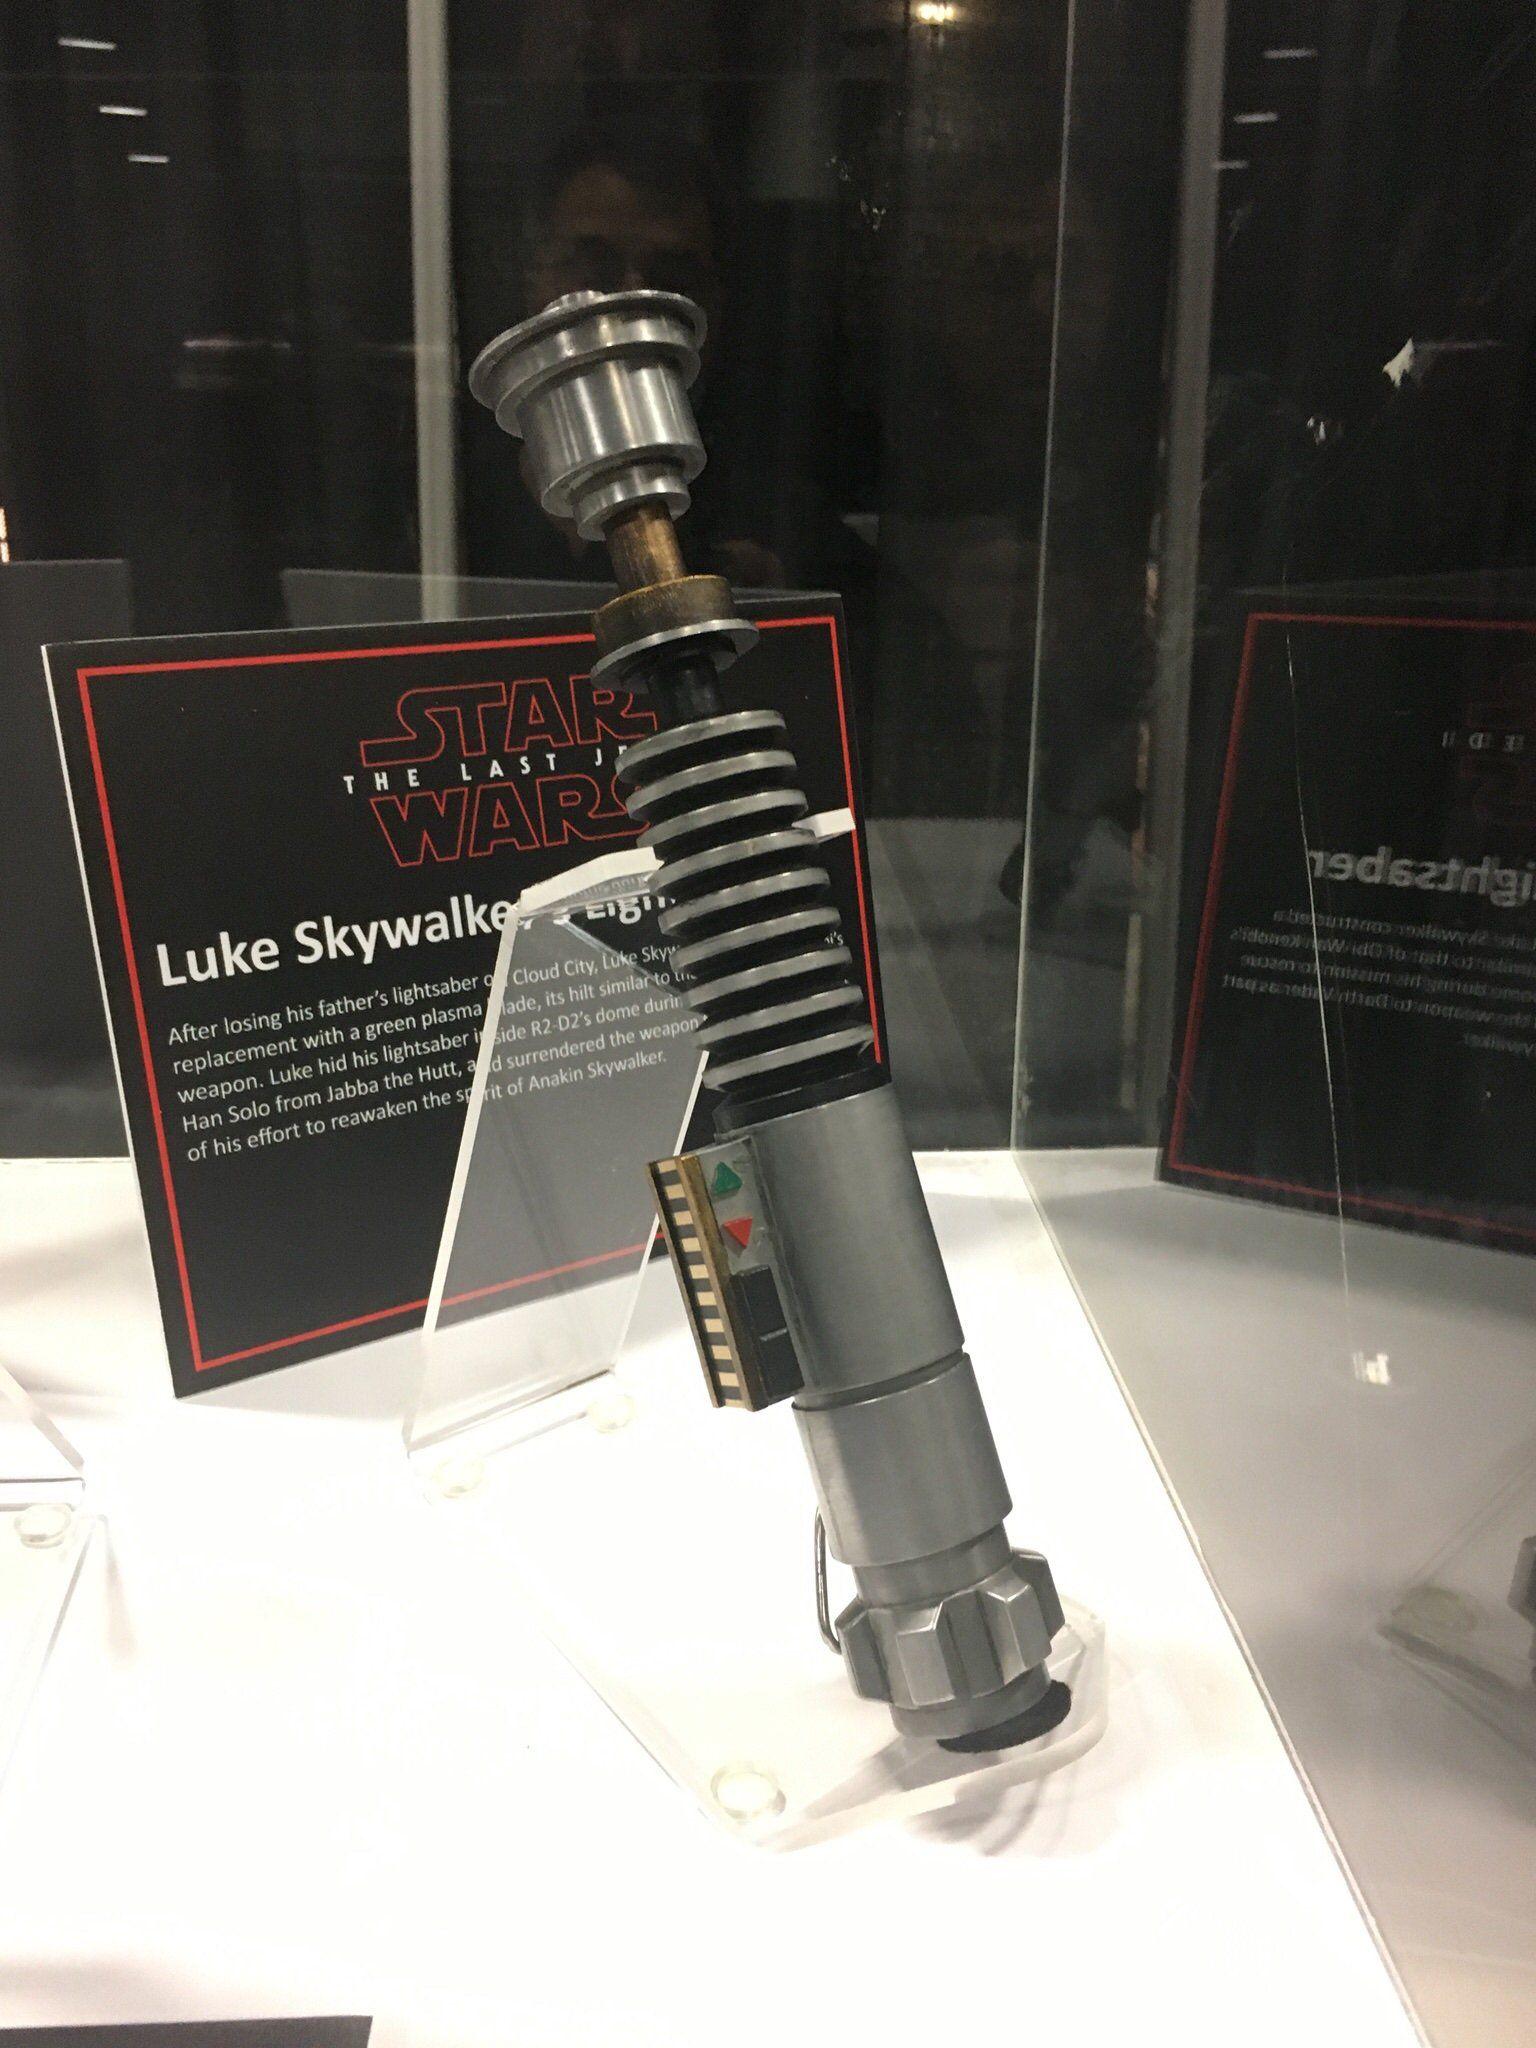 Star Wars The Last Jedi Rey Lightsaber Prop